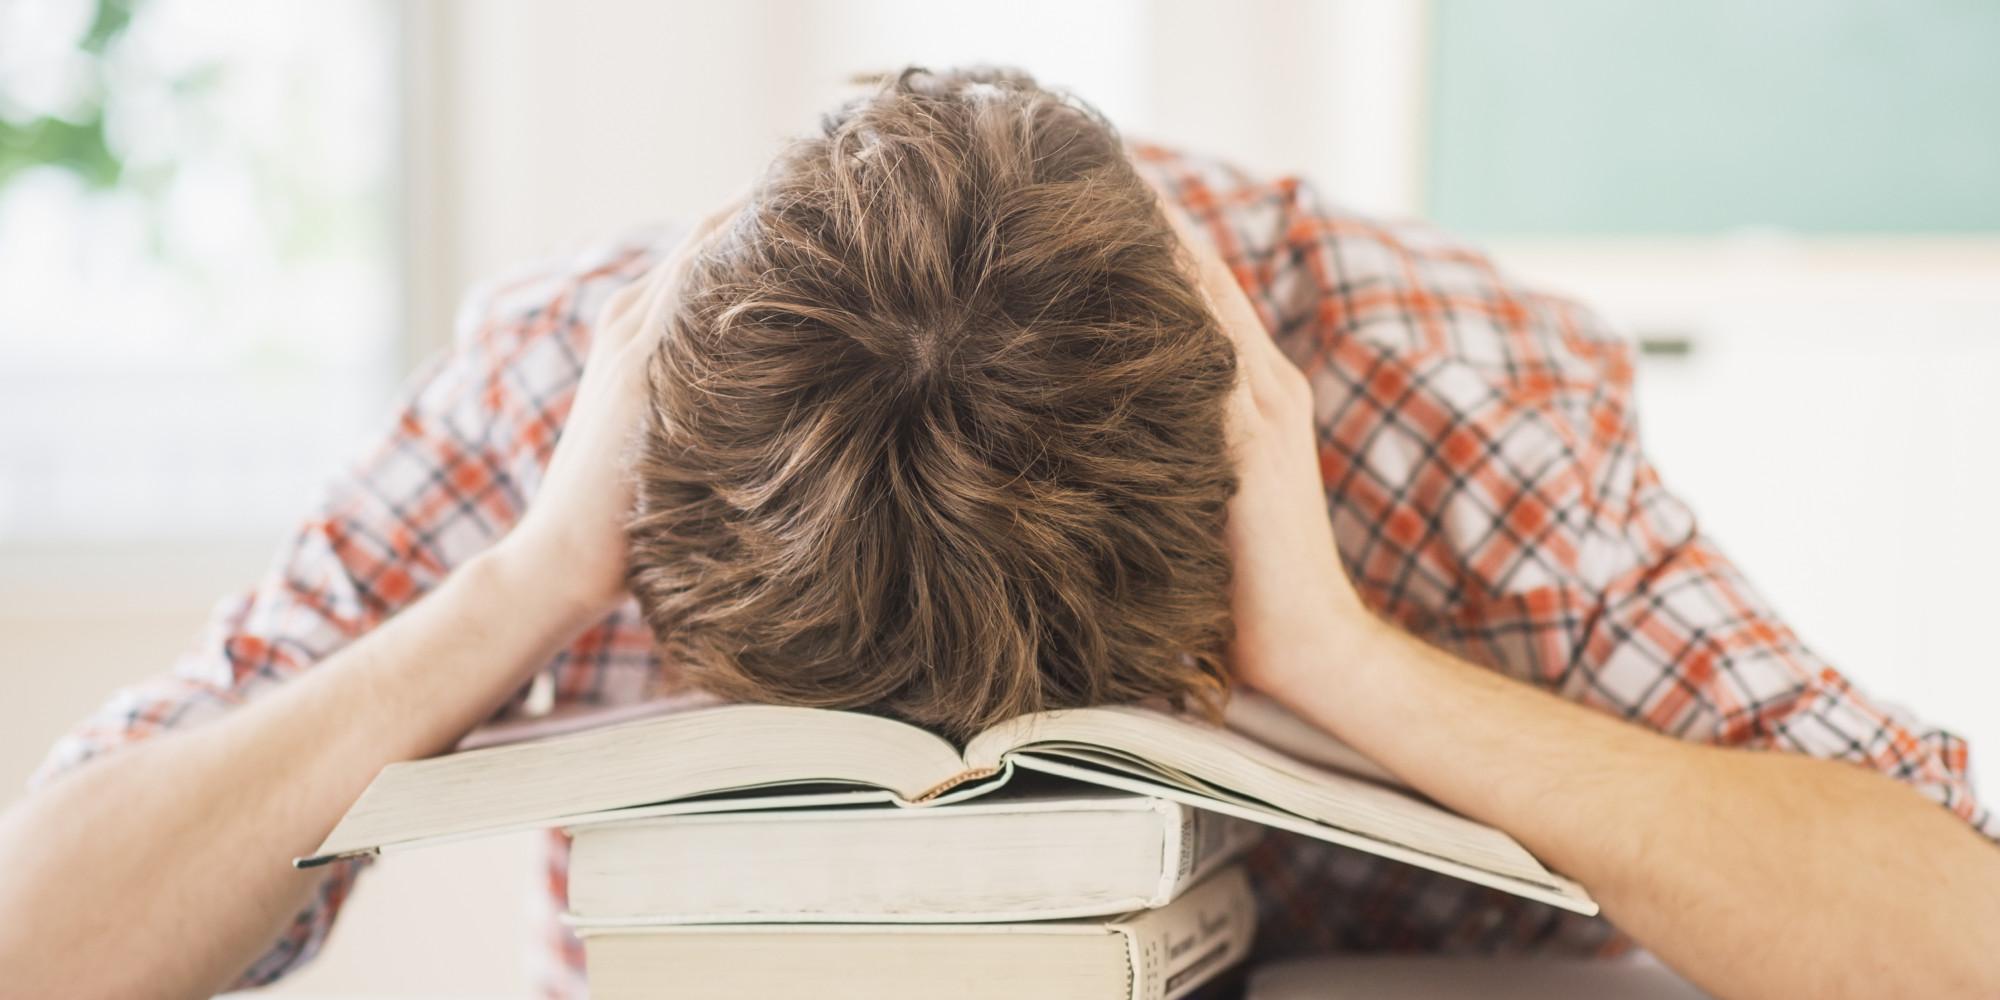 USA, New Jersey, Jersey City, Teenage boy (14-15) sleeping in classroom